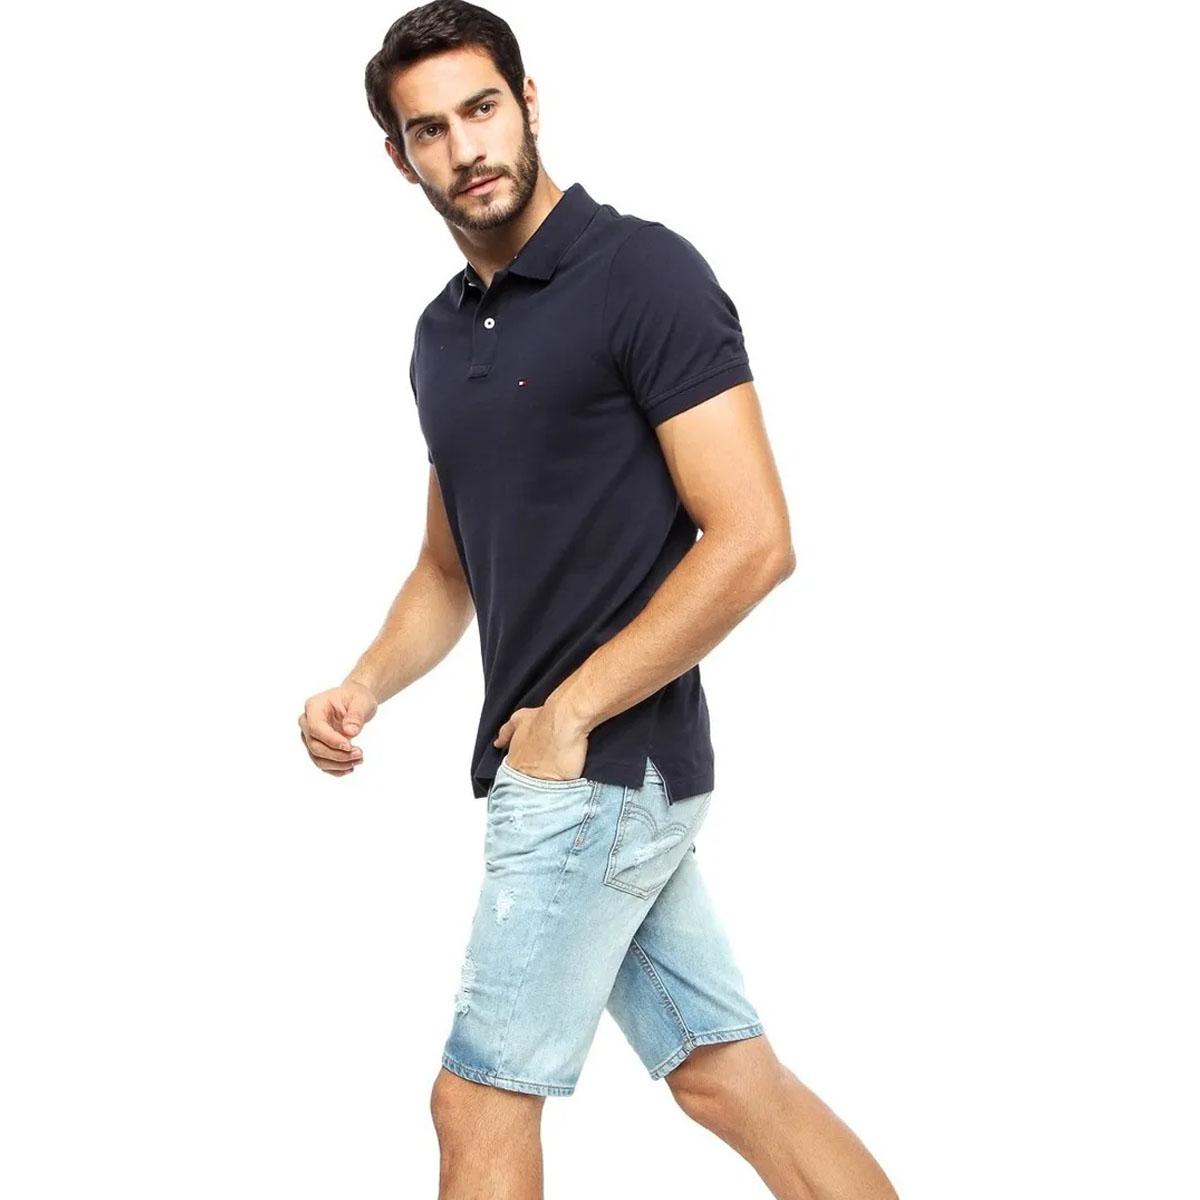 Camisa Polo Tommy Hilfiger Regular Marinho